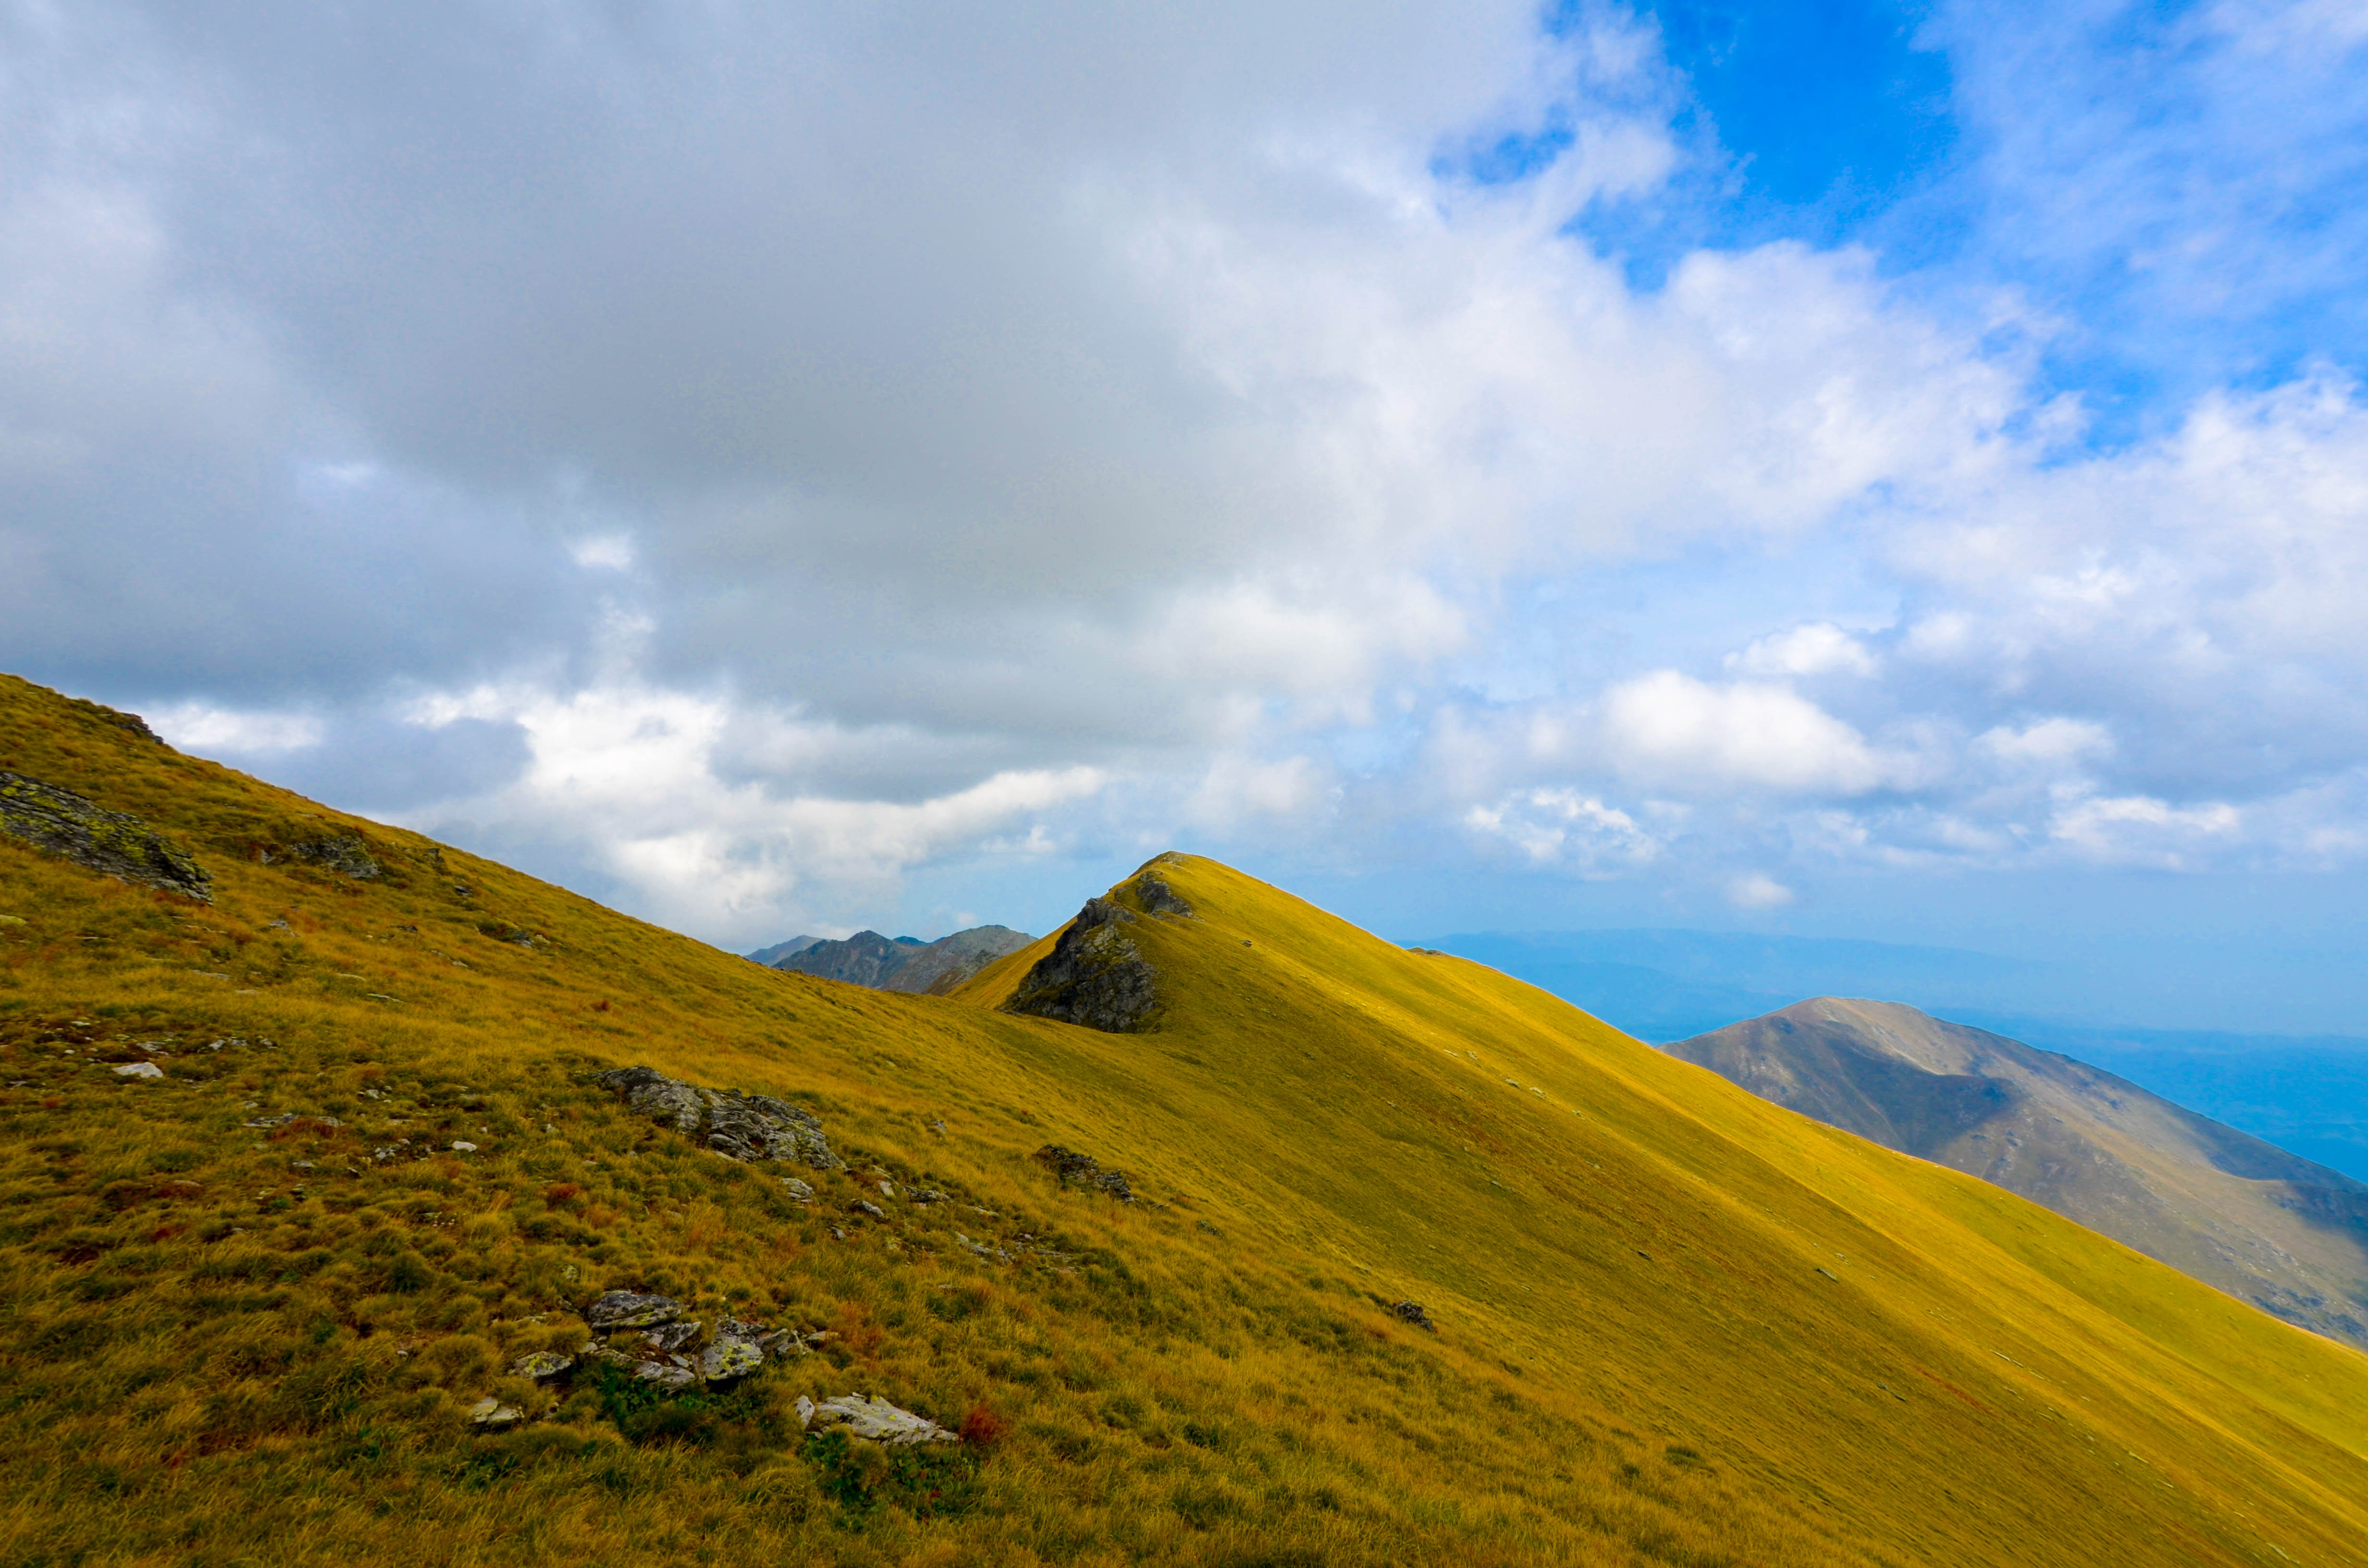 Bistra Peak at an altitude of 2651m